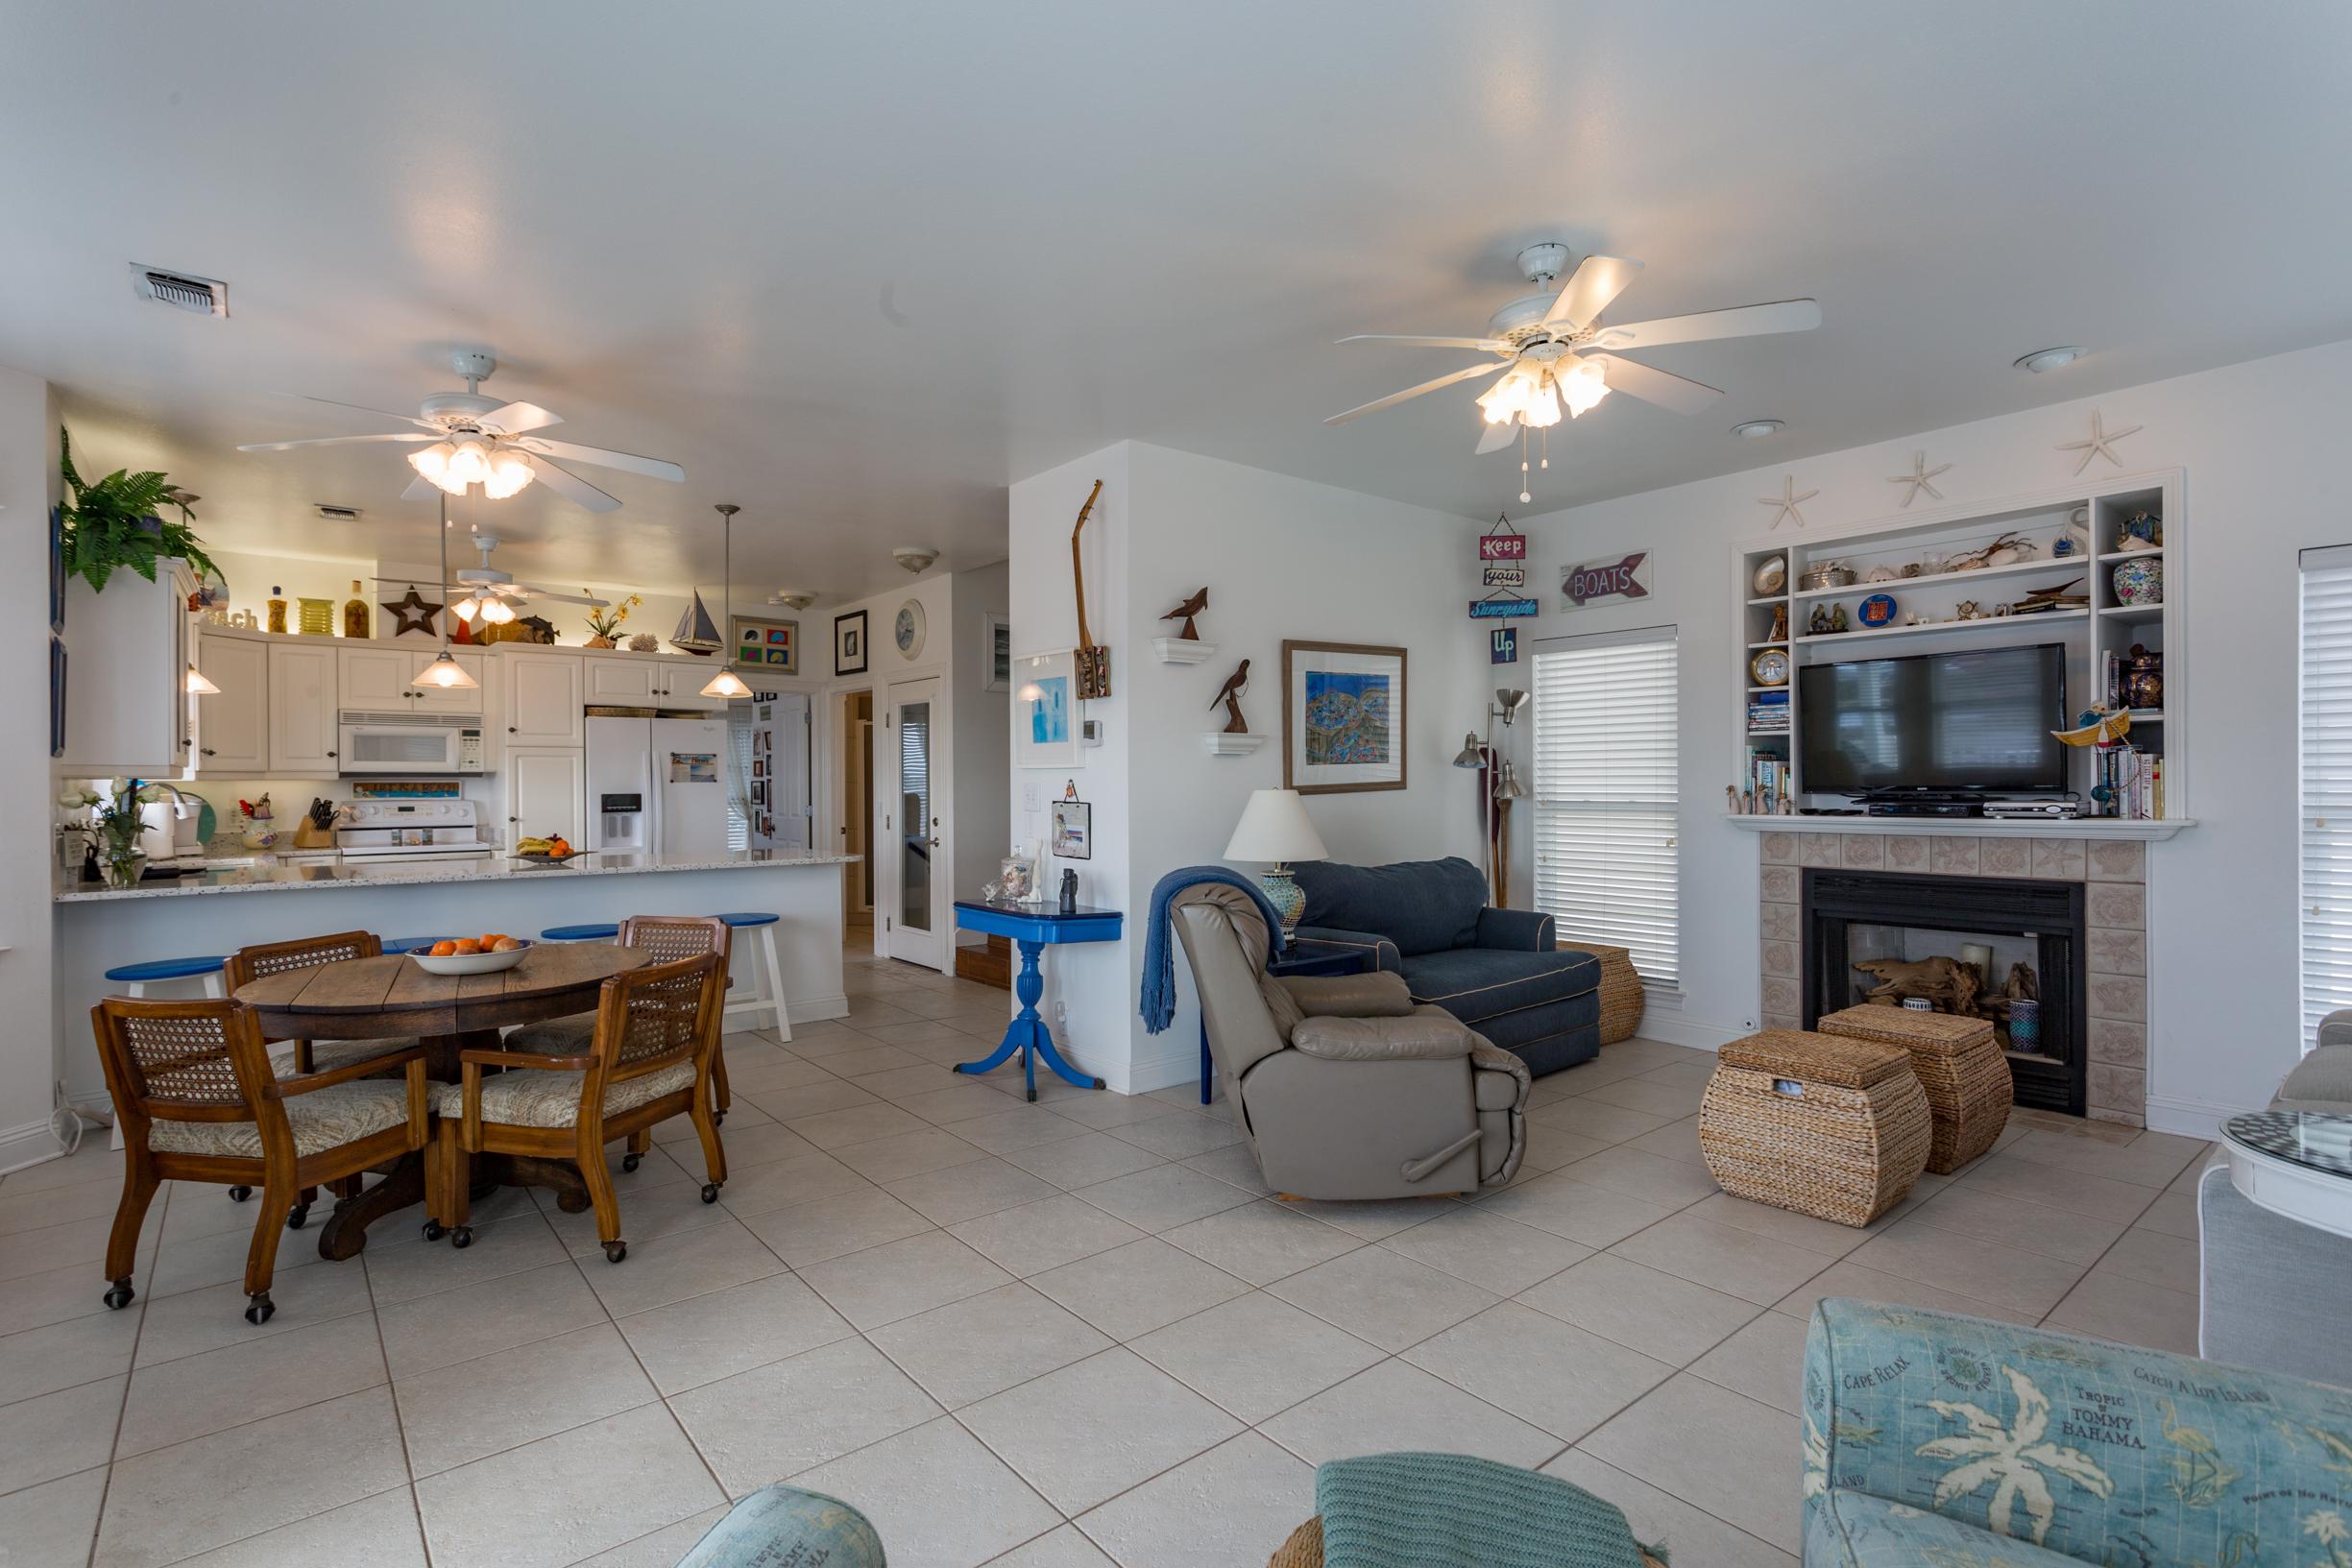 White Sands Cottage 501 Life's a Beach House Townhouse rental in White Sands Pensacola Beach in Pensacola Beach Florida - #17